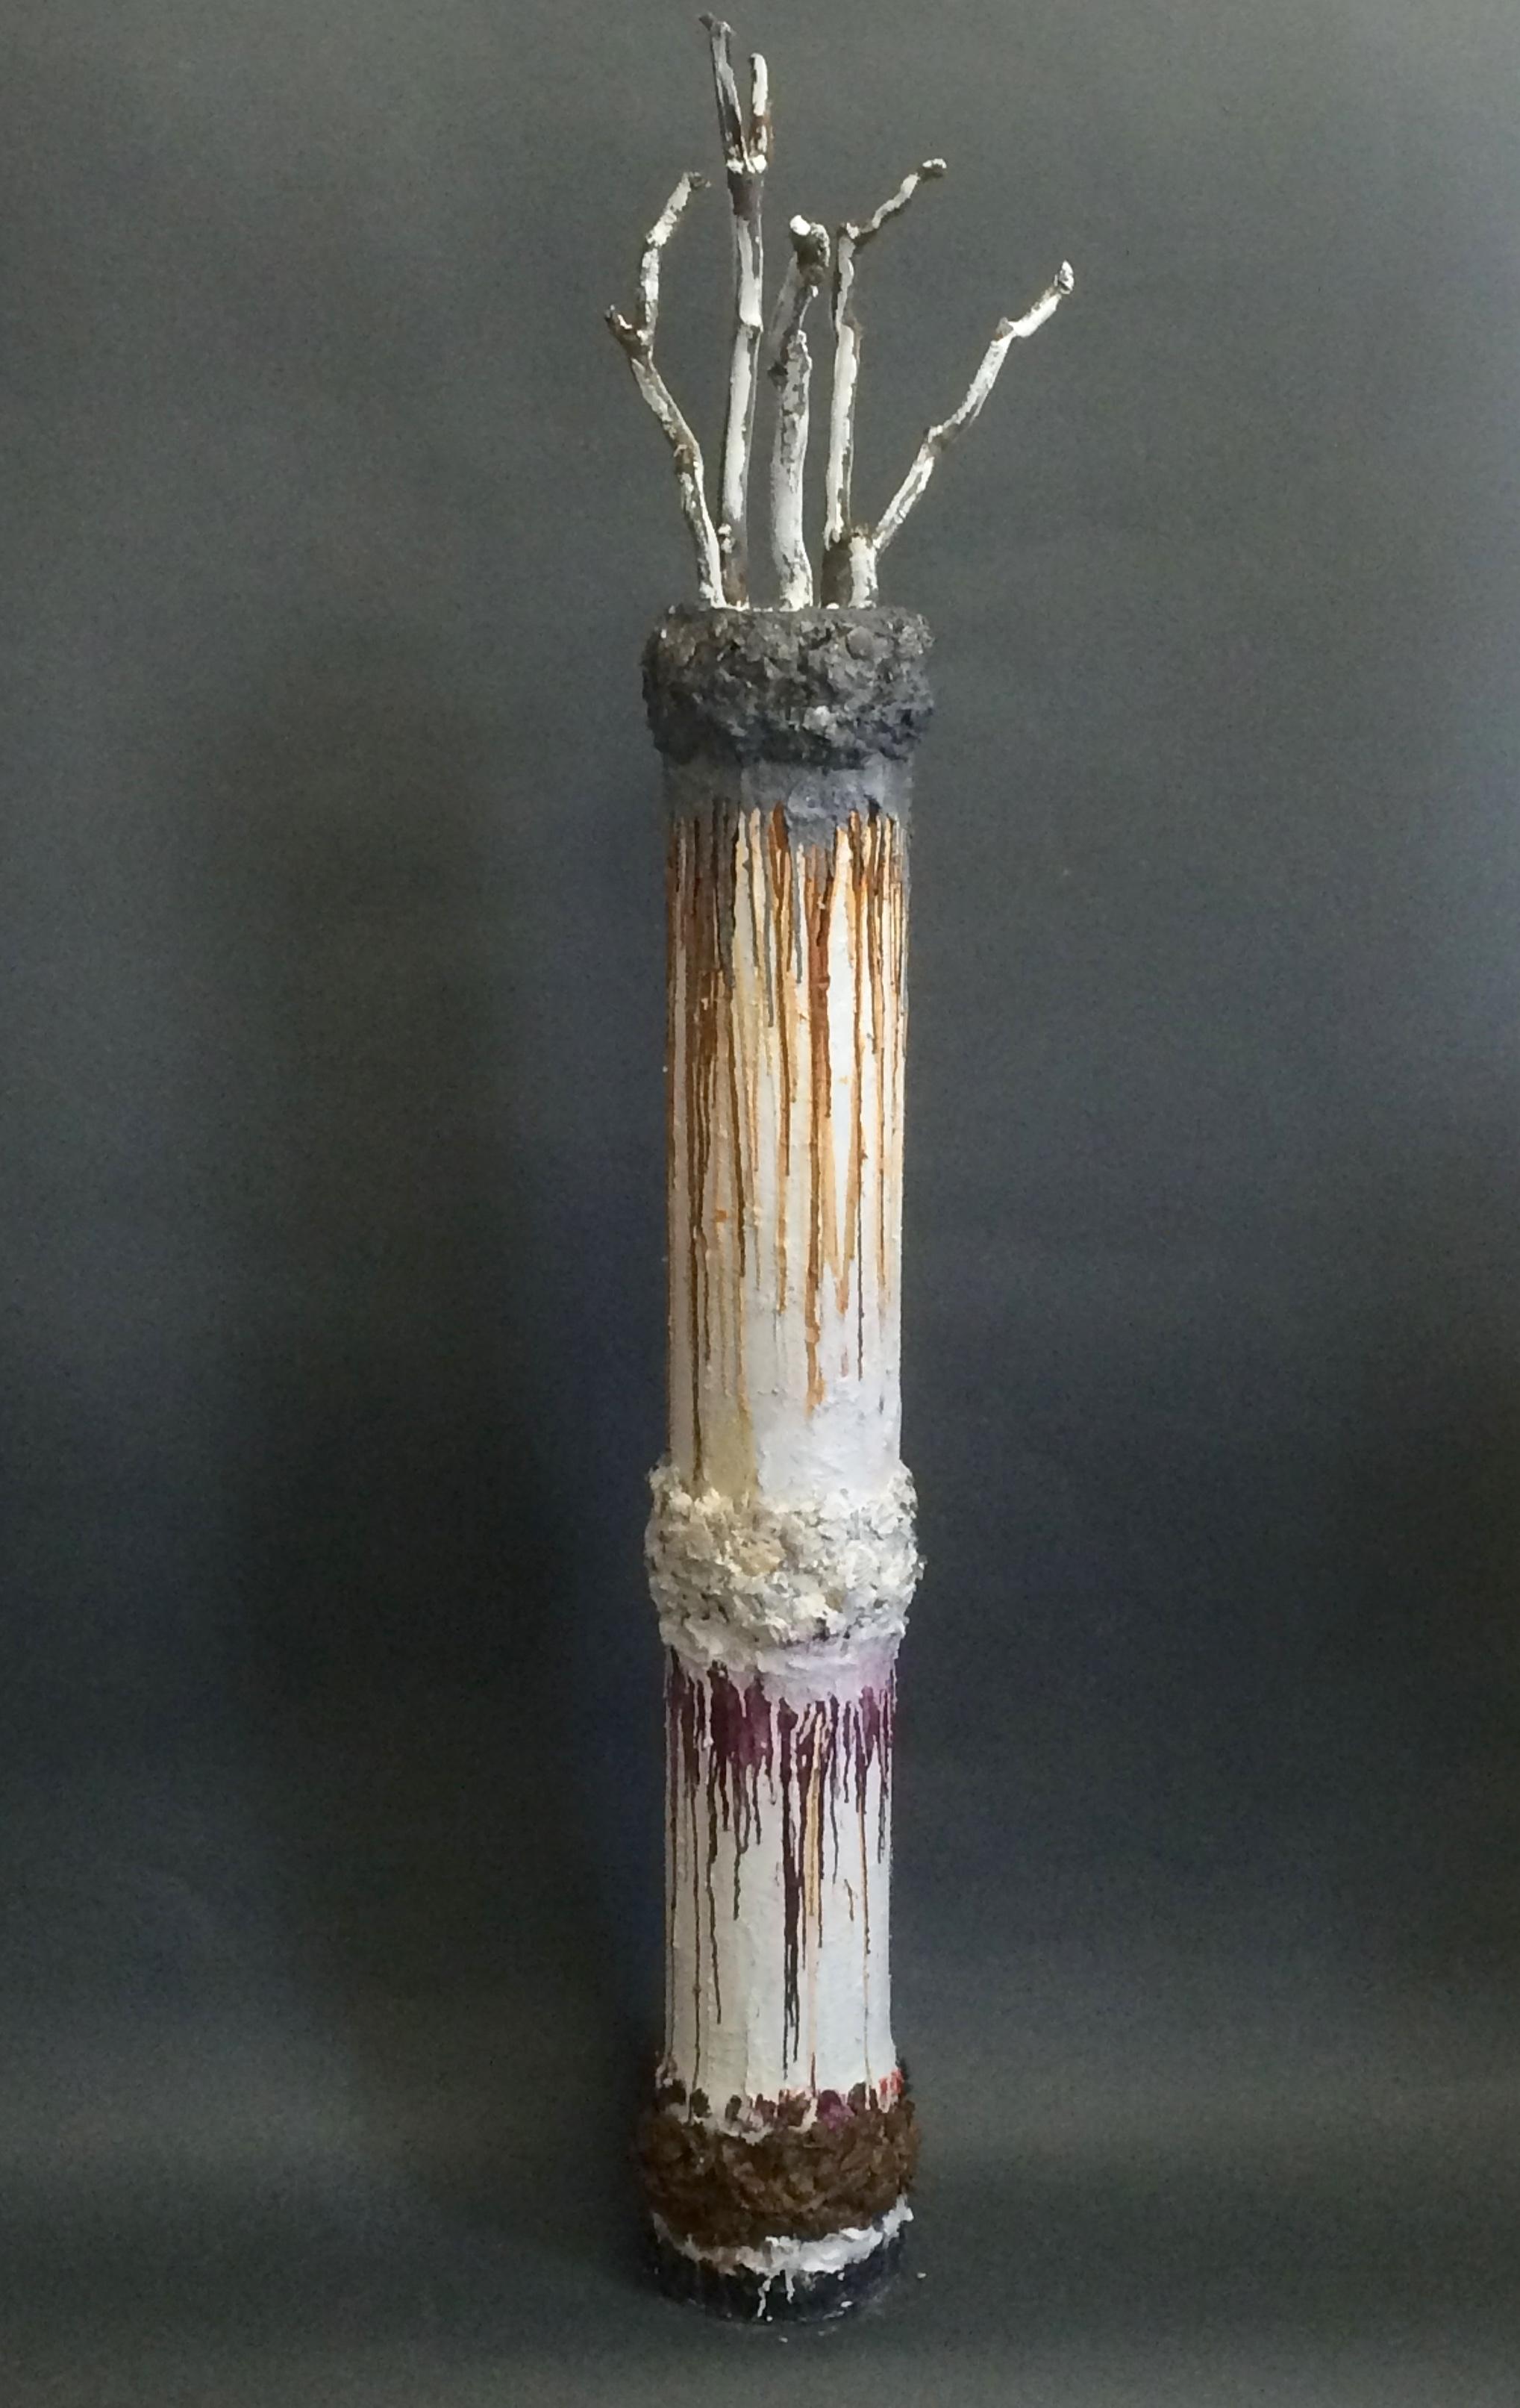 Creation  Oil, wax, sand, seashells,glass, quartz, styrofoam, glue, gesso,branches on PVC 63 x 10.25 x 7.5 in / 160 x 26 x 19 cm